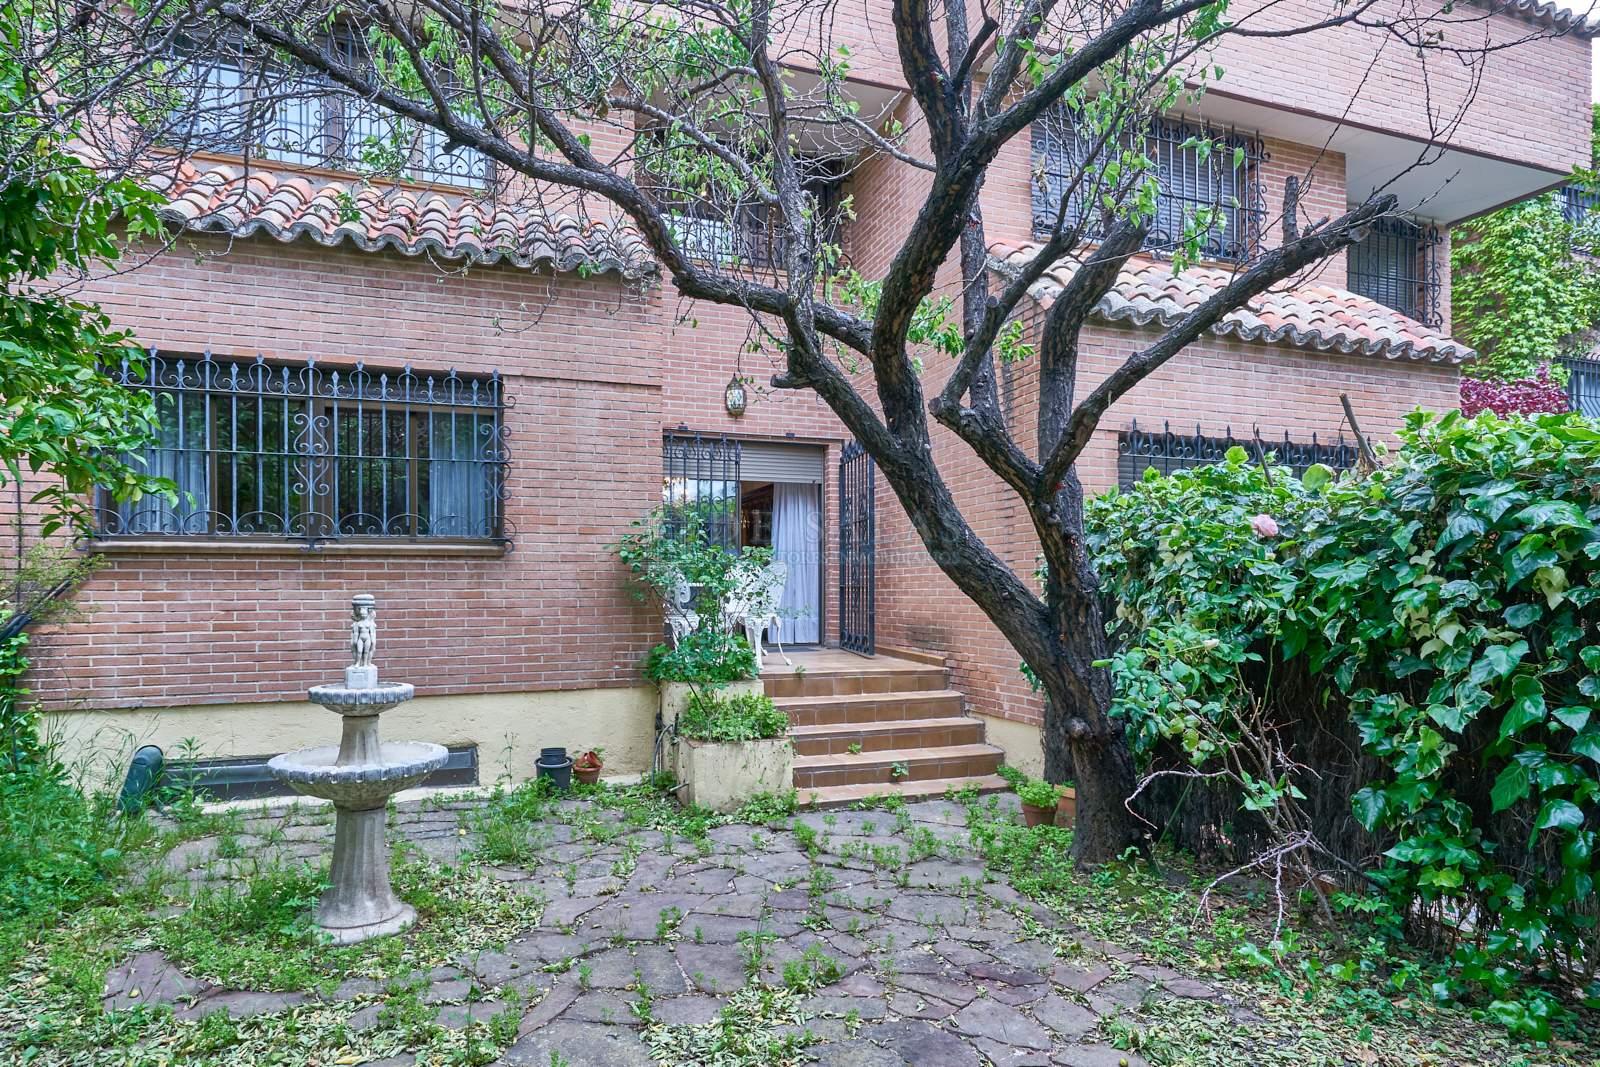 0010 House Arturo Soria